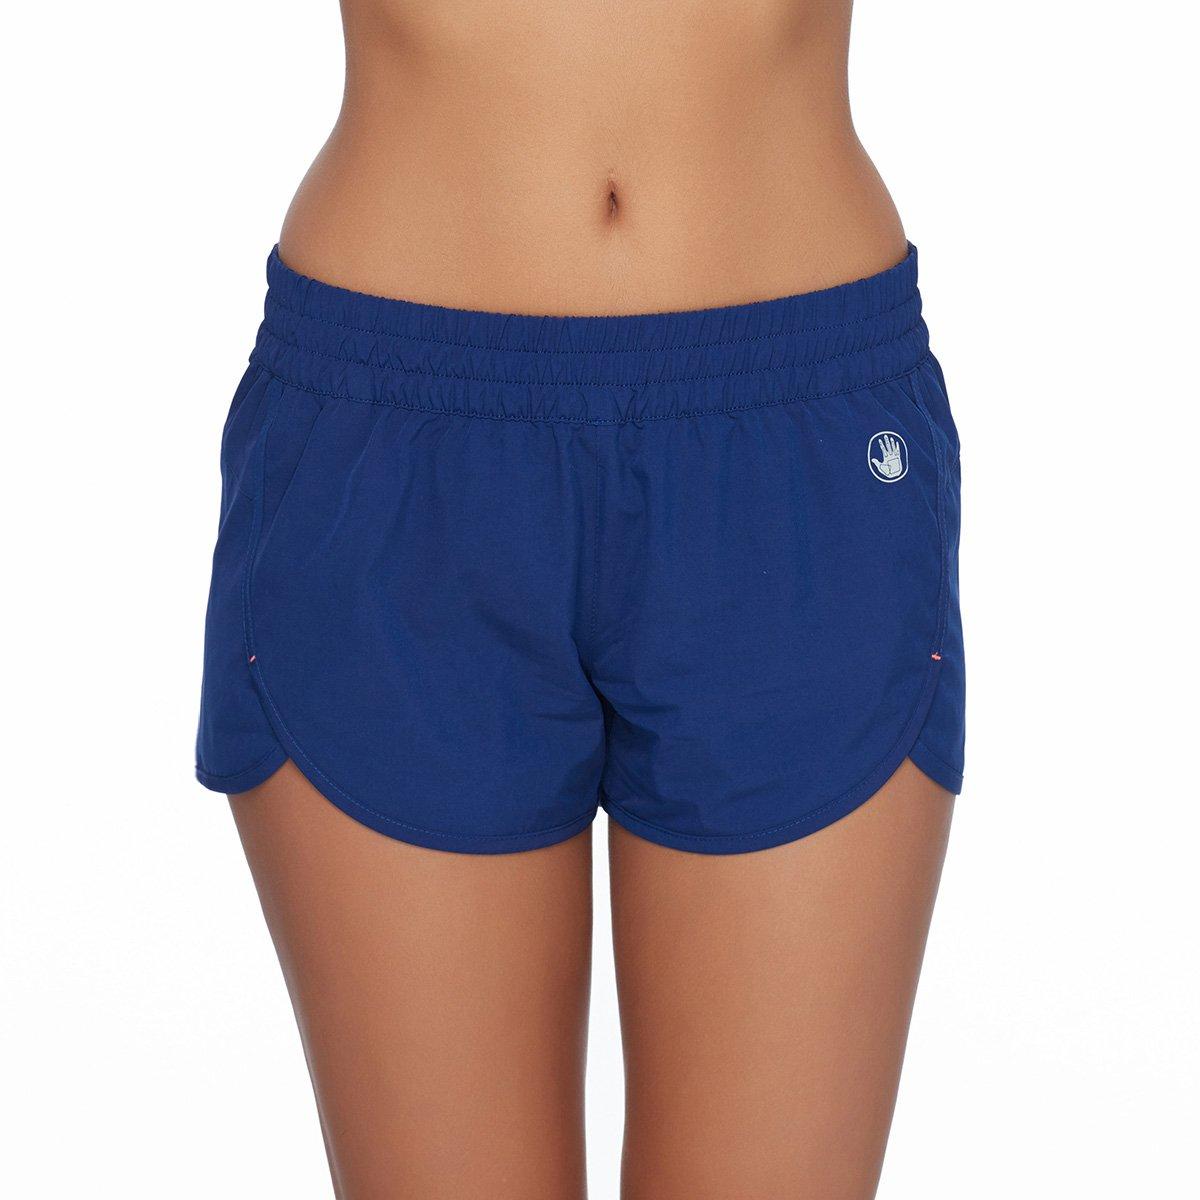 Midnight Breezy Shorts